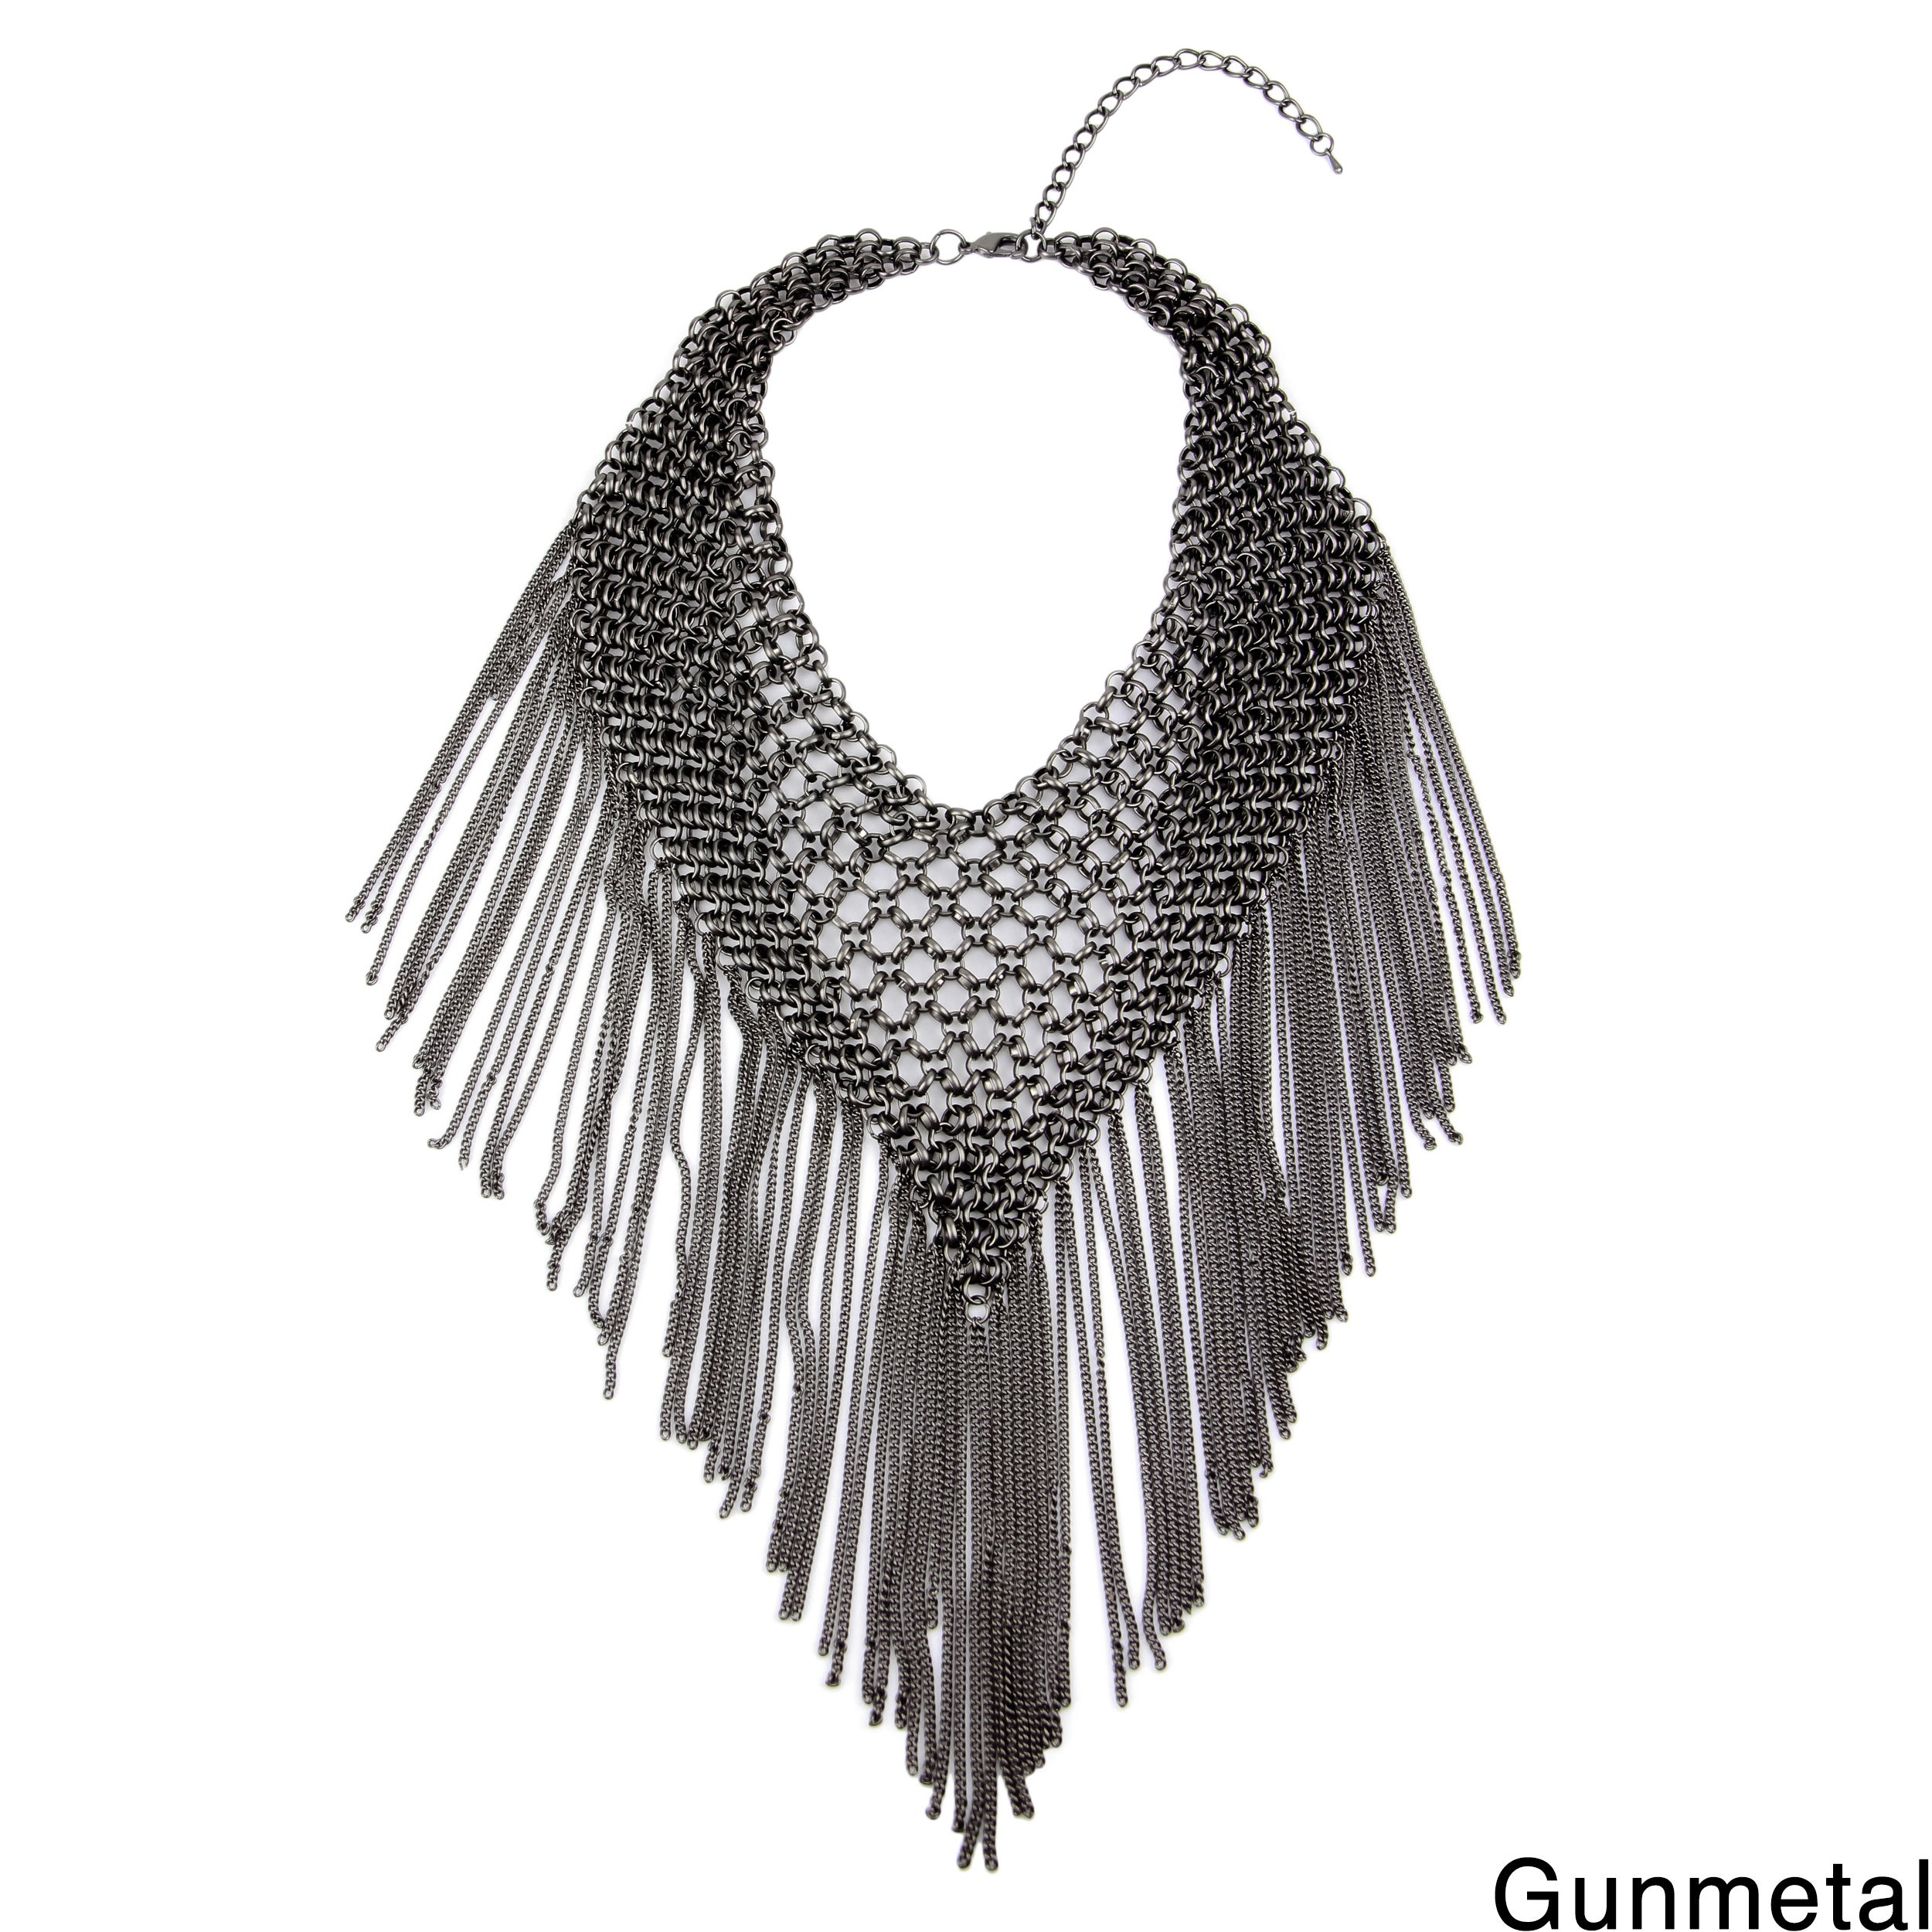 Handmade Saachi Triangle Statement Chain Bib Necklace wit...